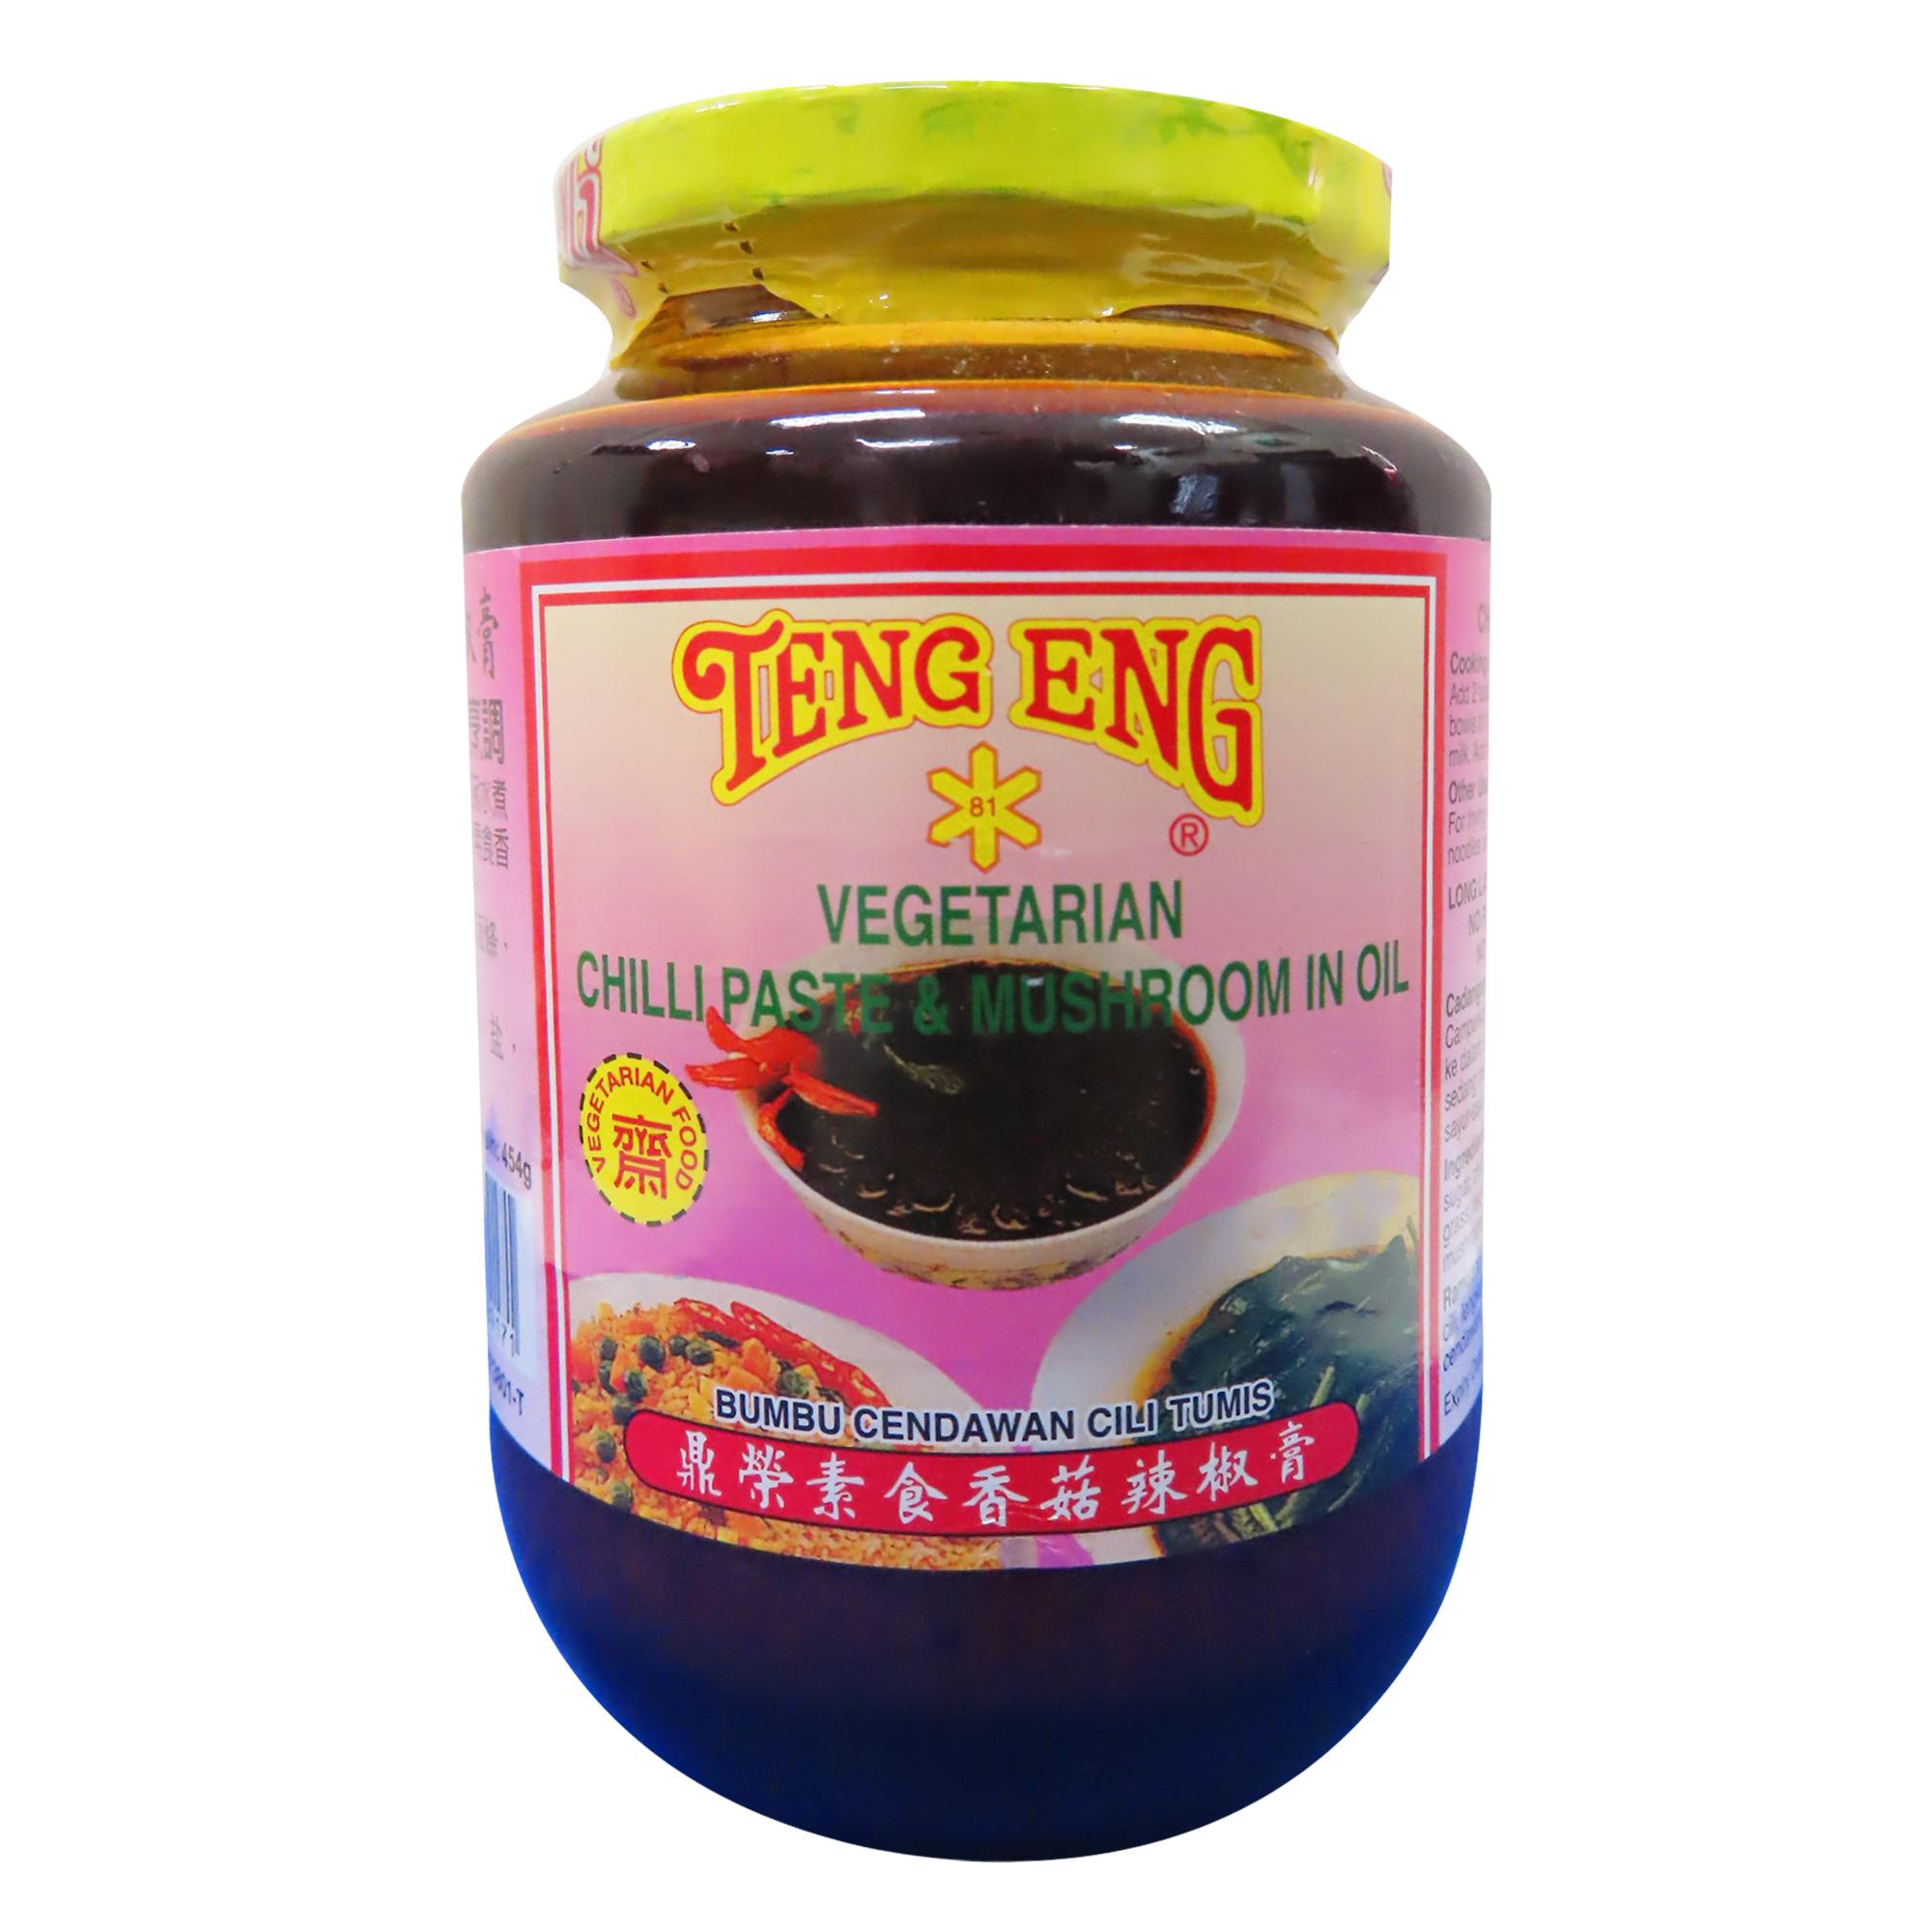 Image Vegetarian Chili Paste and mushroom 鼎荣-香菇辣椒膏 454grams